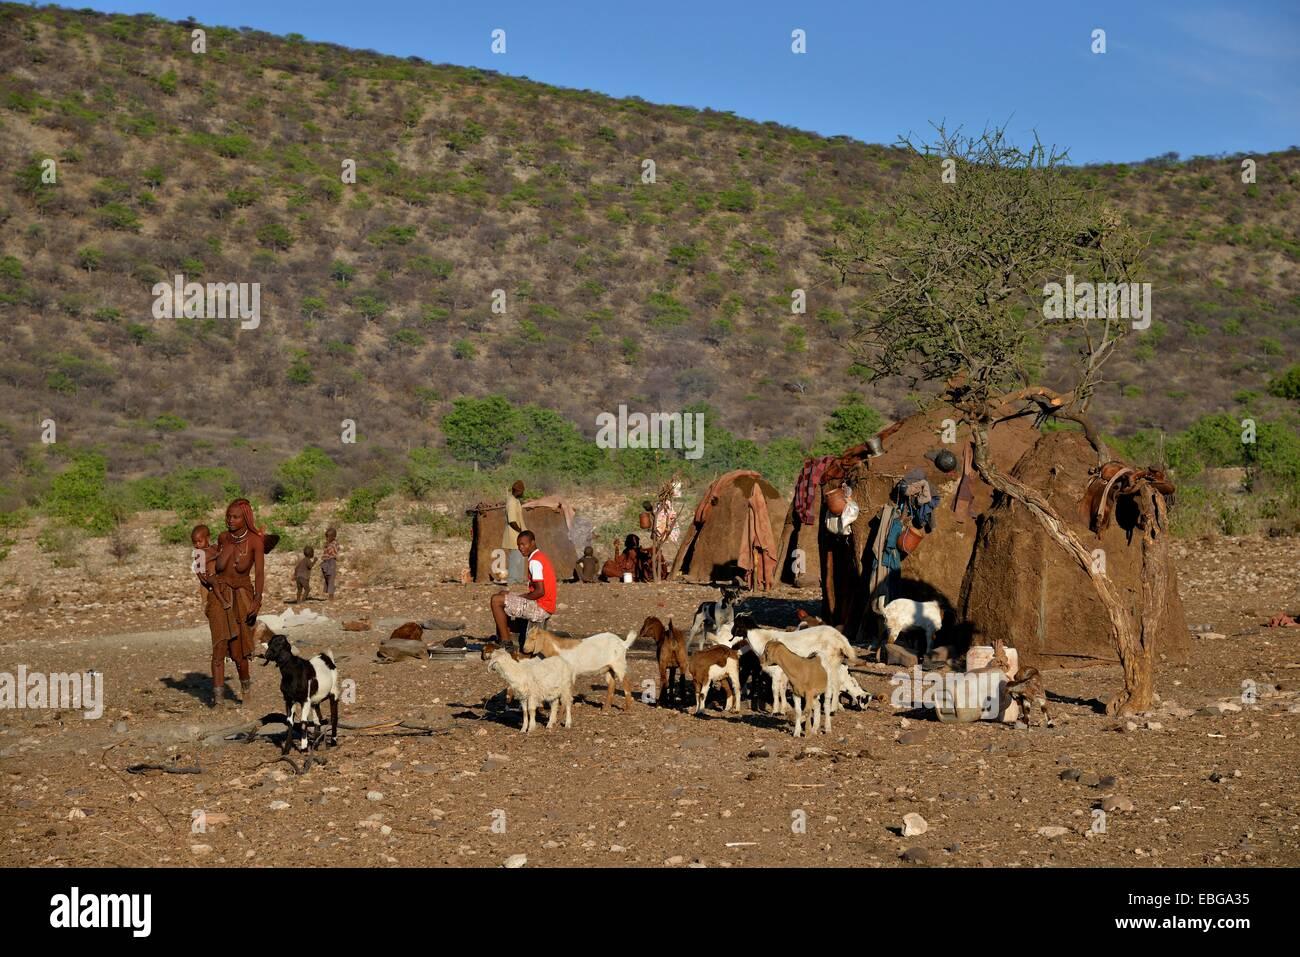 Himba people with goats in front of Himba huts, Ombombo, Kaokoland, Kunene, Namibia - Stock Image